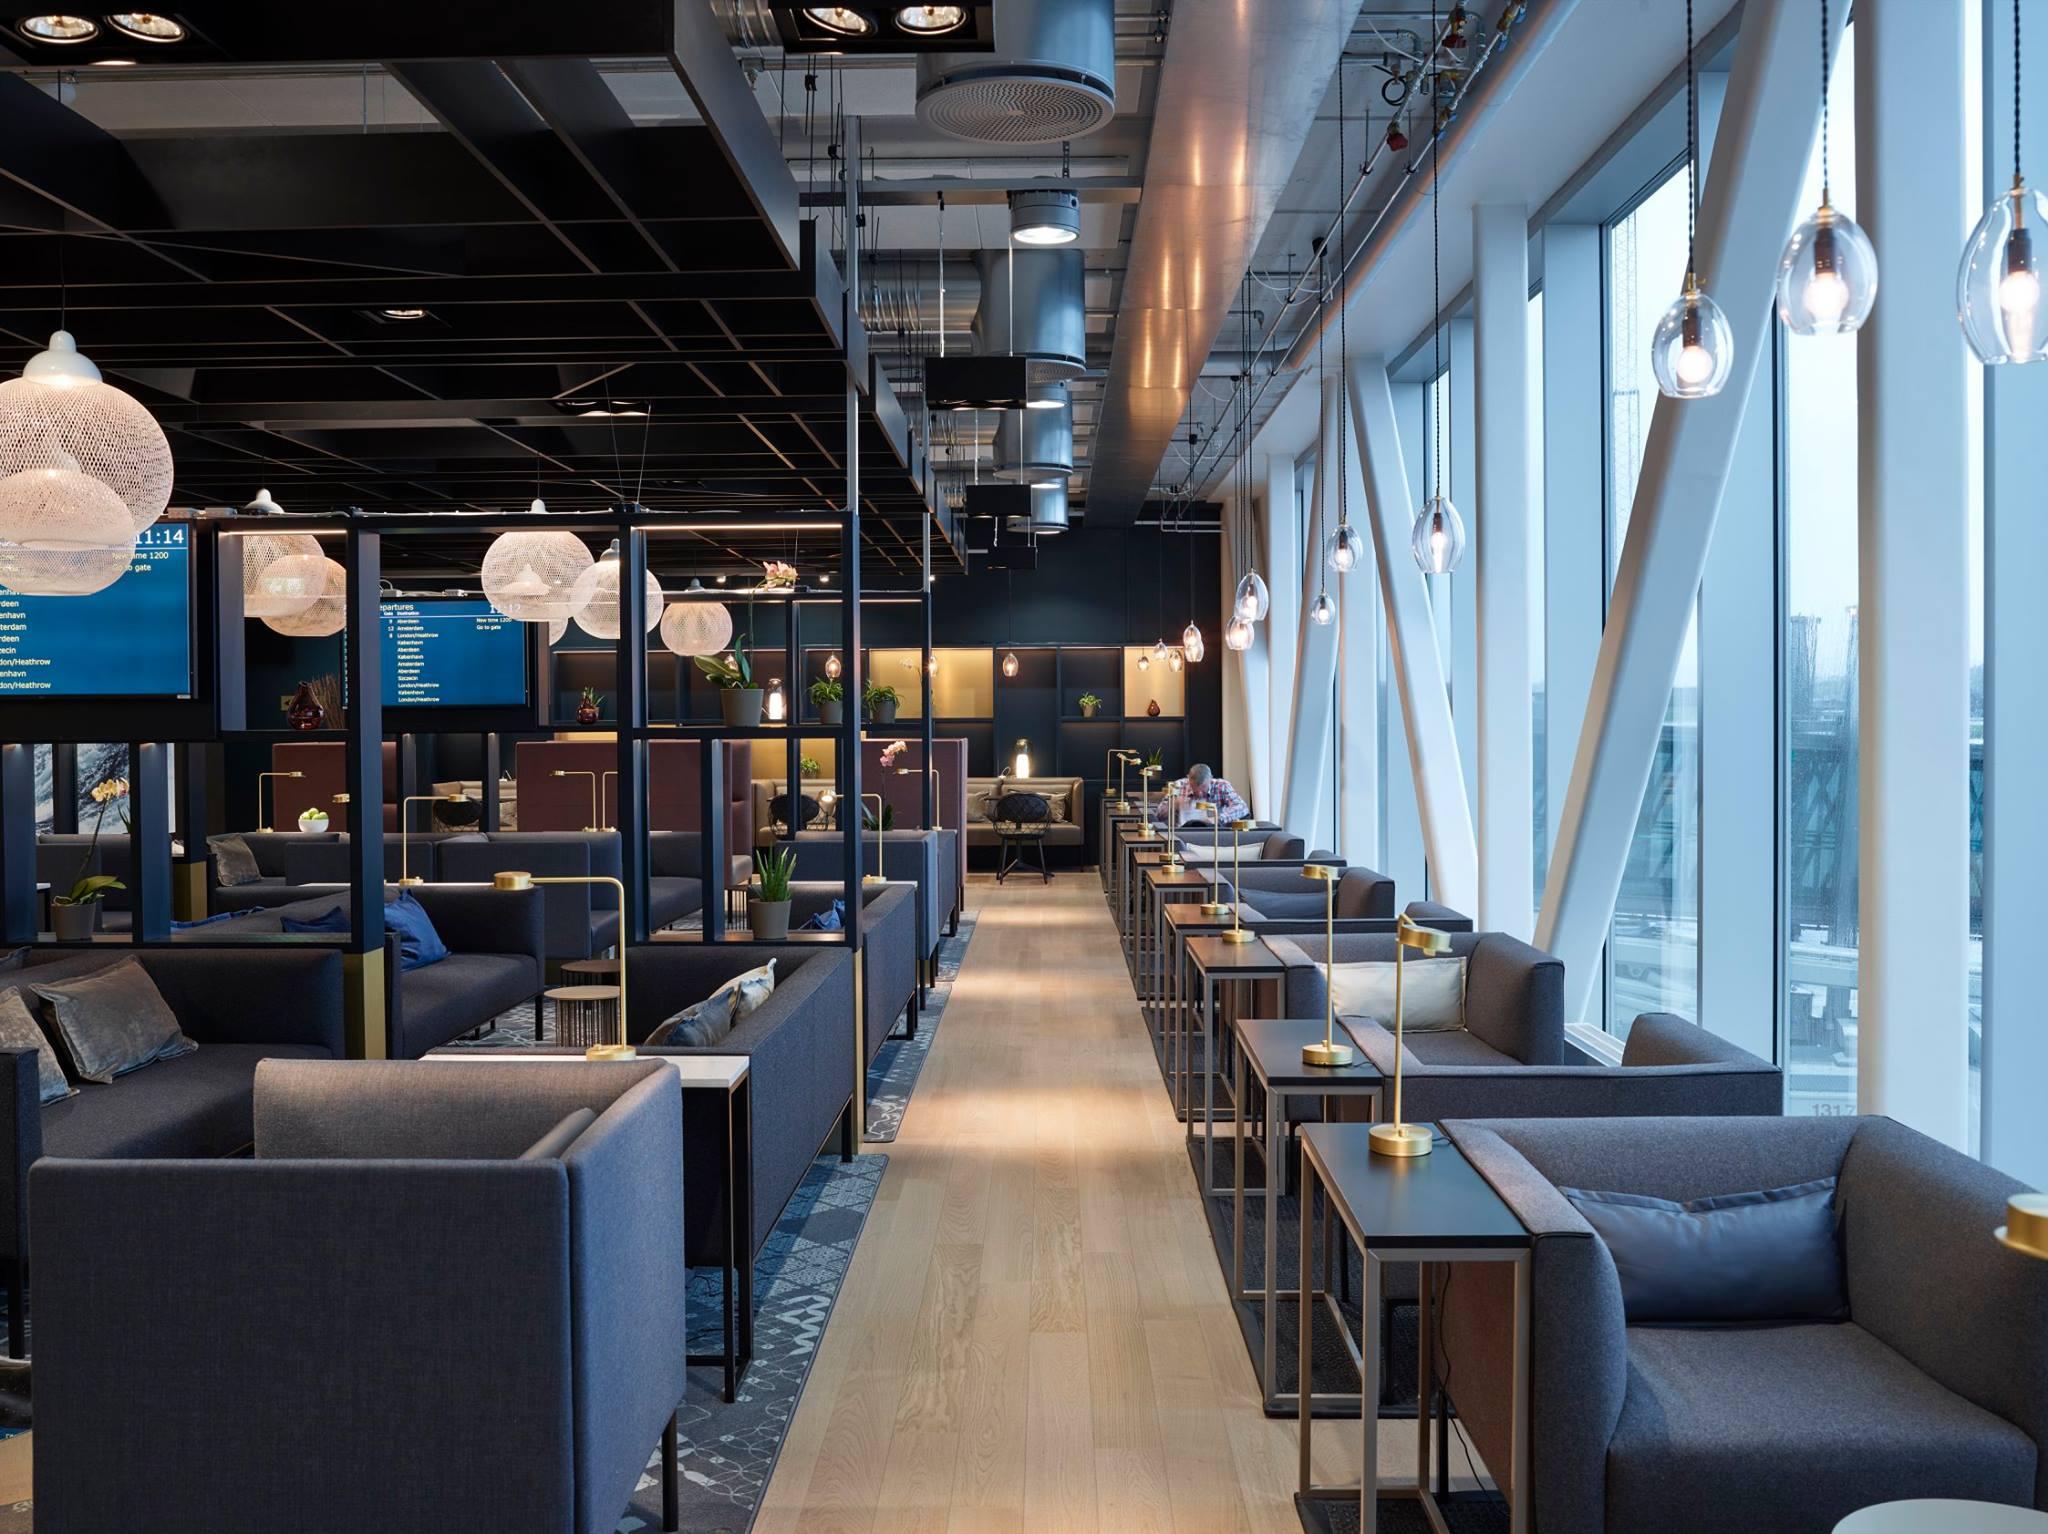 Business+Lounge+Stavanger+Lufthavn+002 (1).jpg